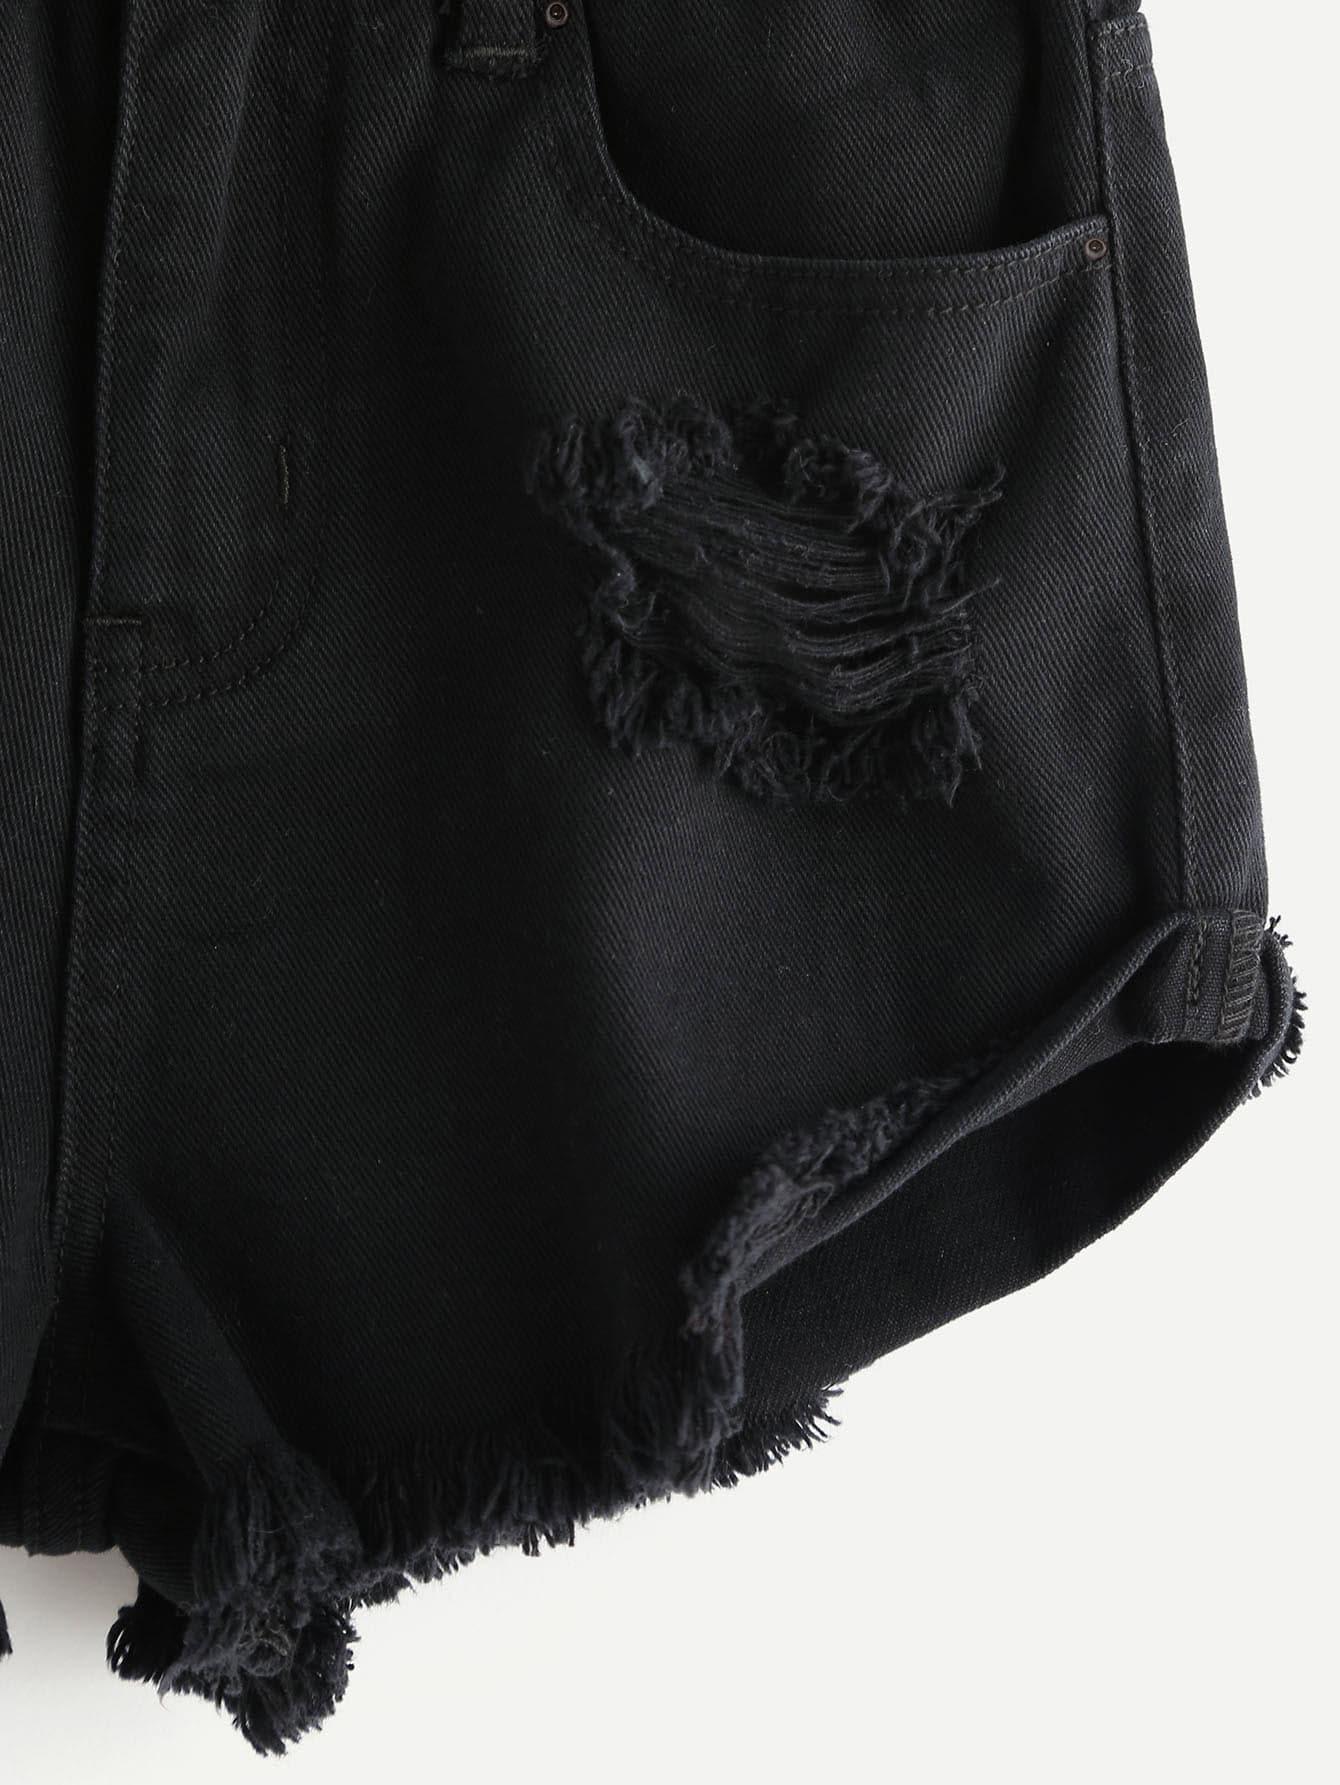 shorts170310452_2